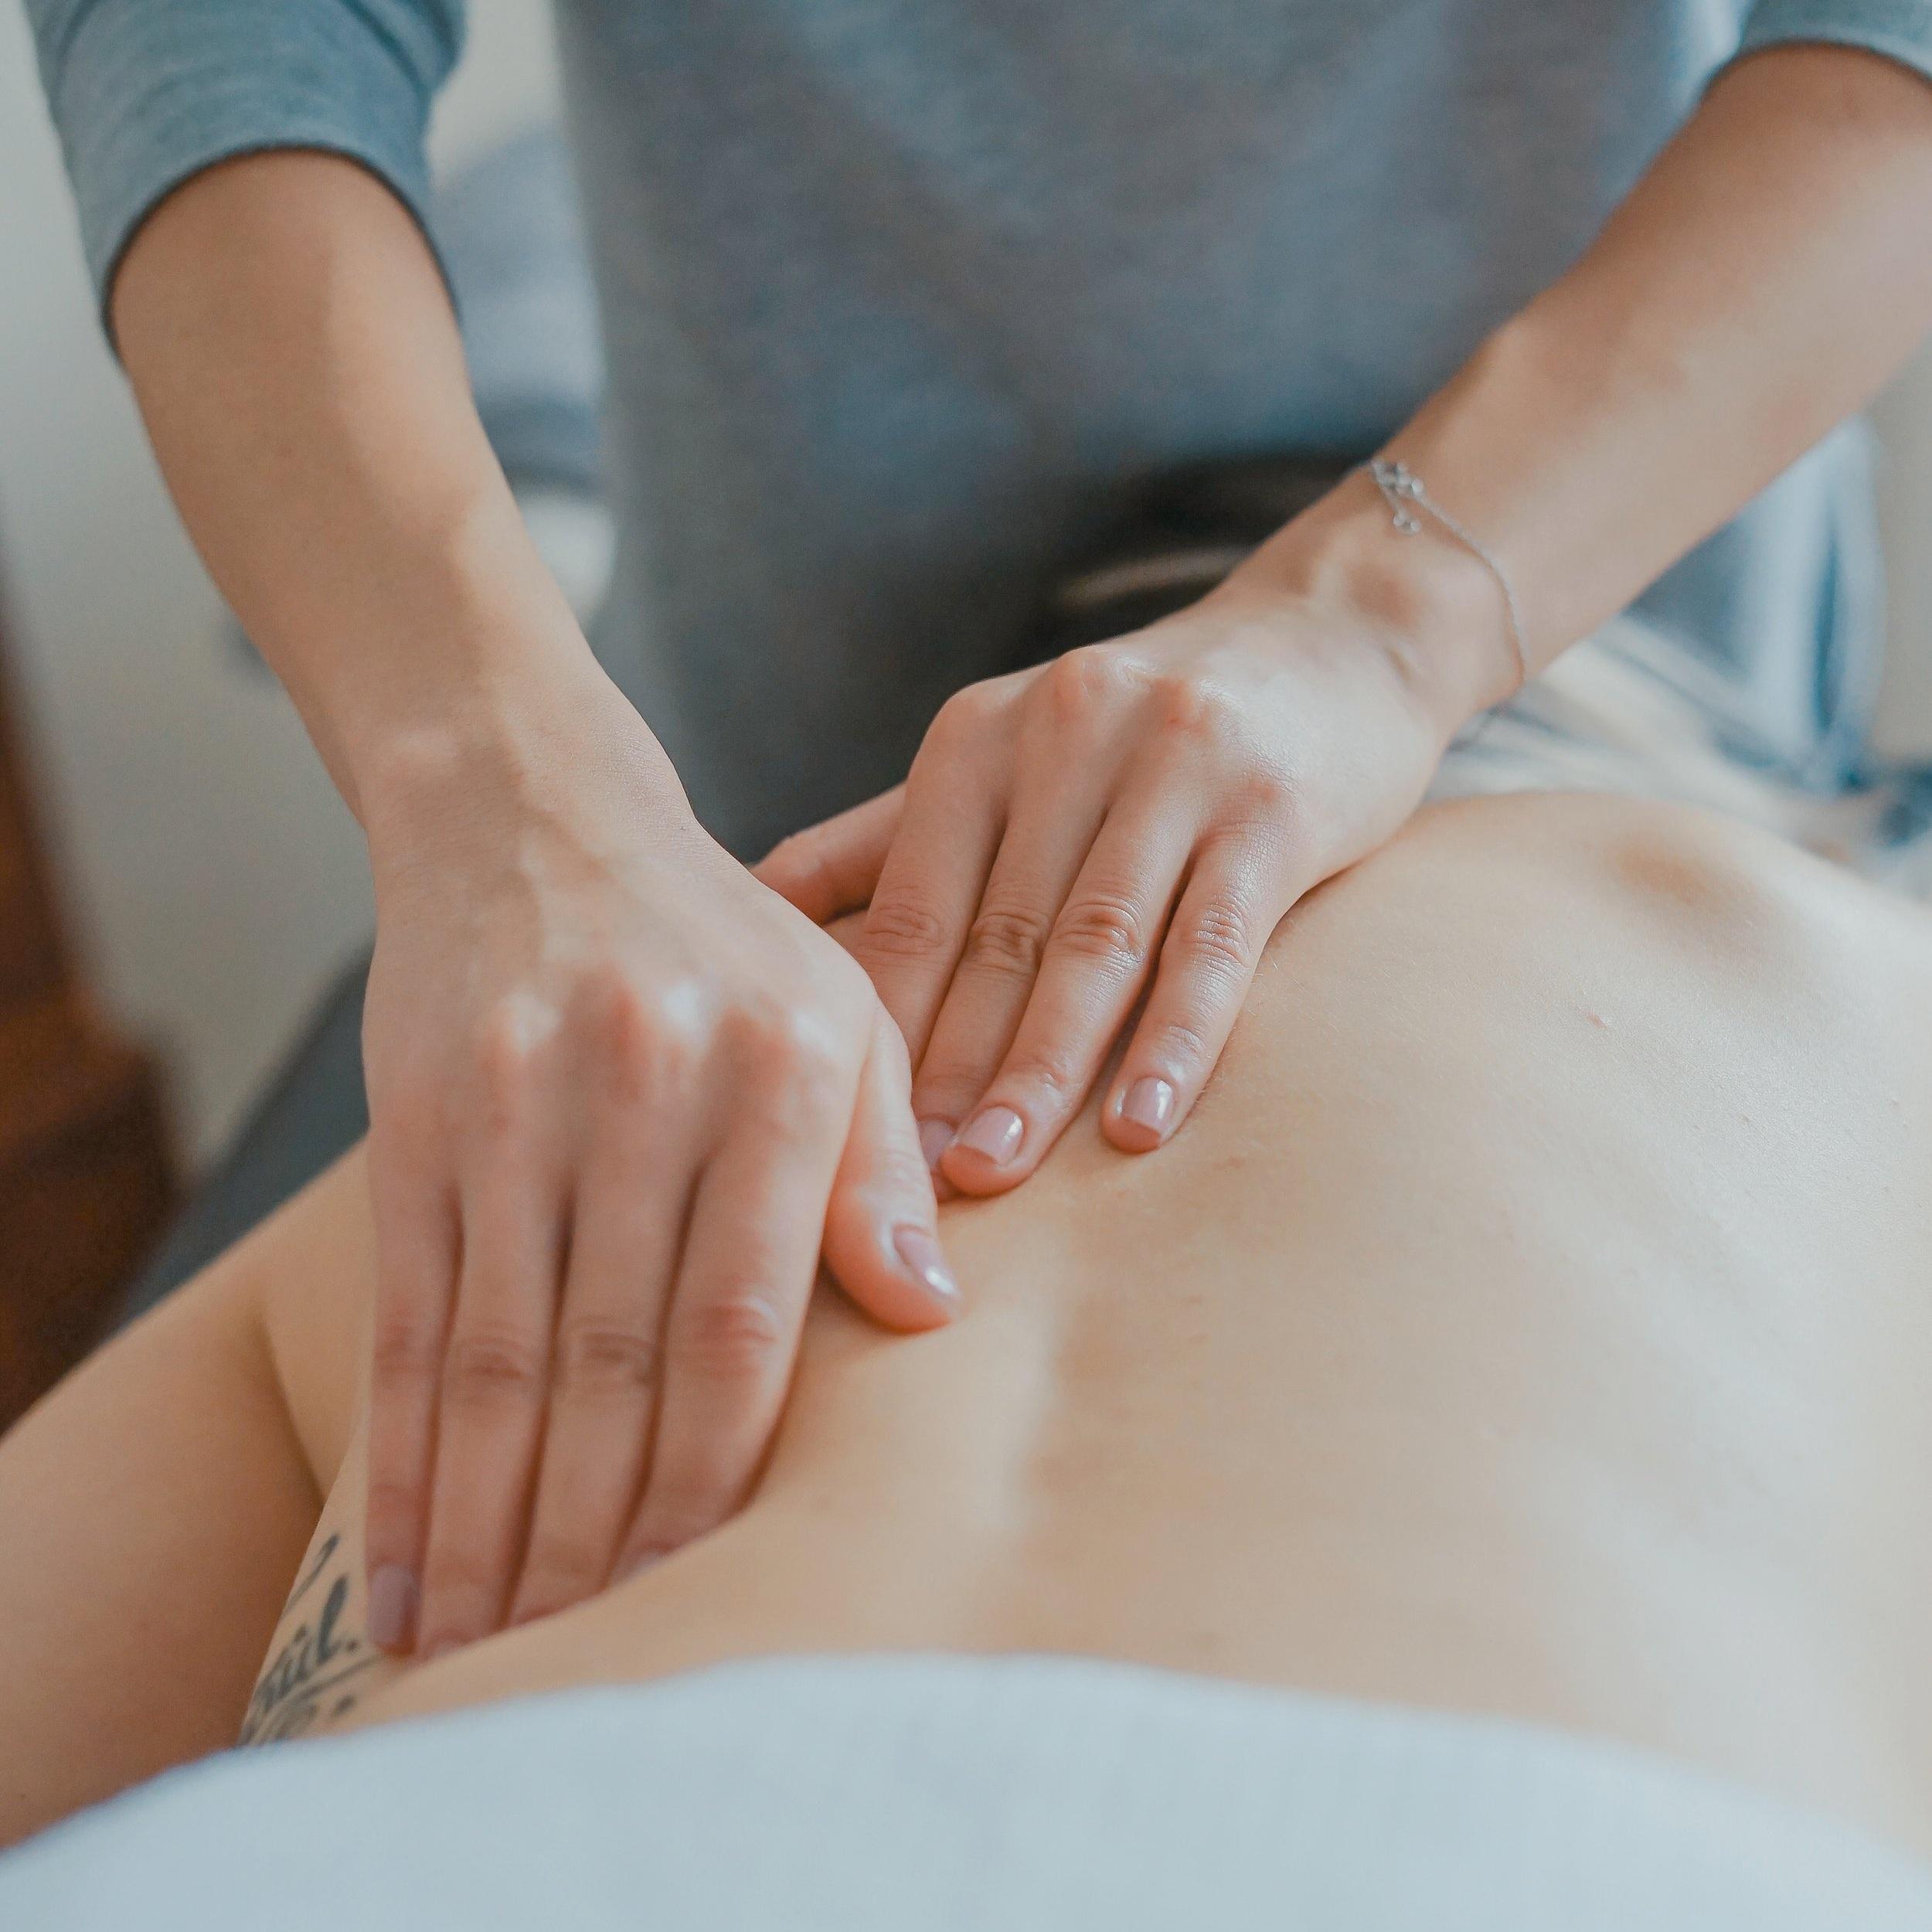 Massage - Deep Intuitive Table Massage • Maya Abdominal Massage • Thai Massage